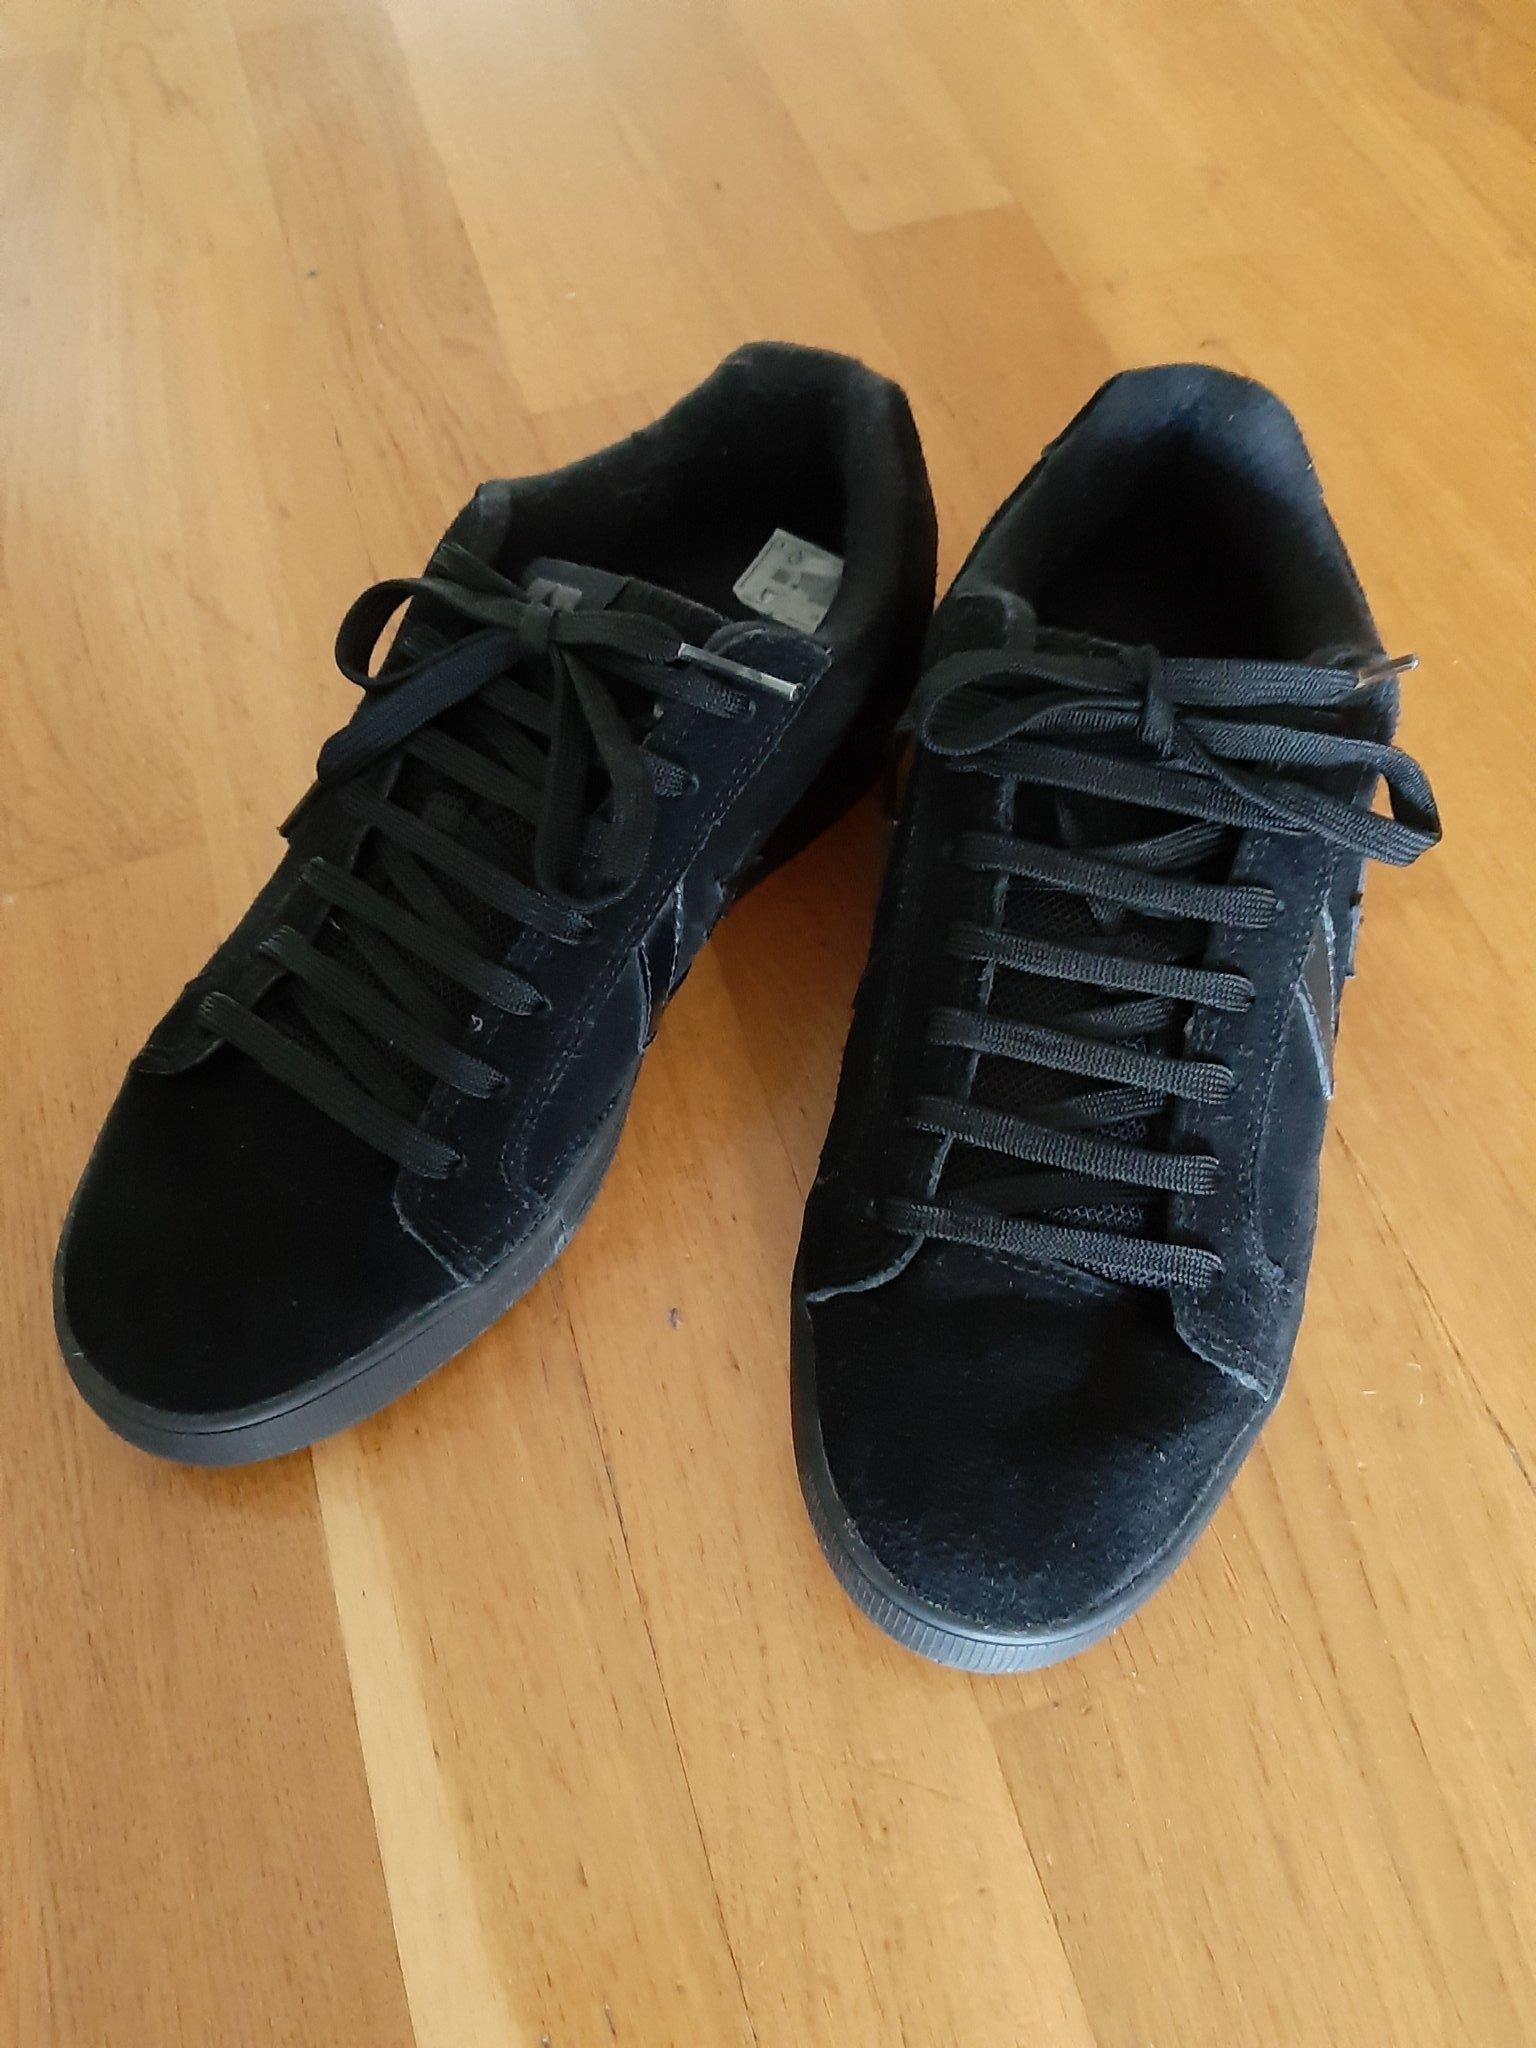 Converse All Star Rune sneakers 43 43.5EU (354907327) ᐈ Köp